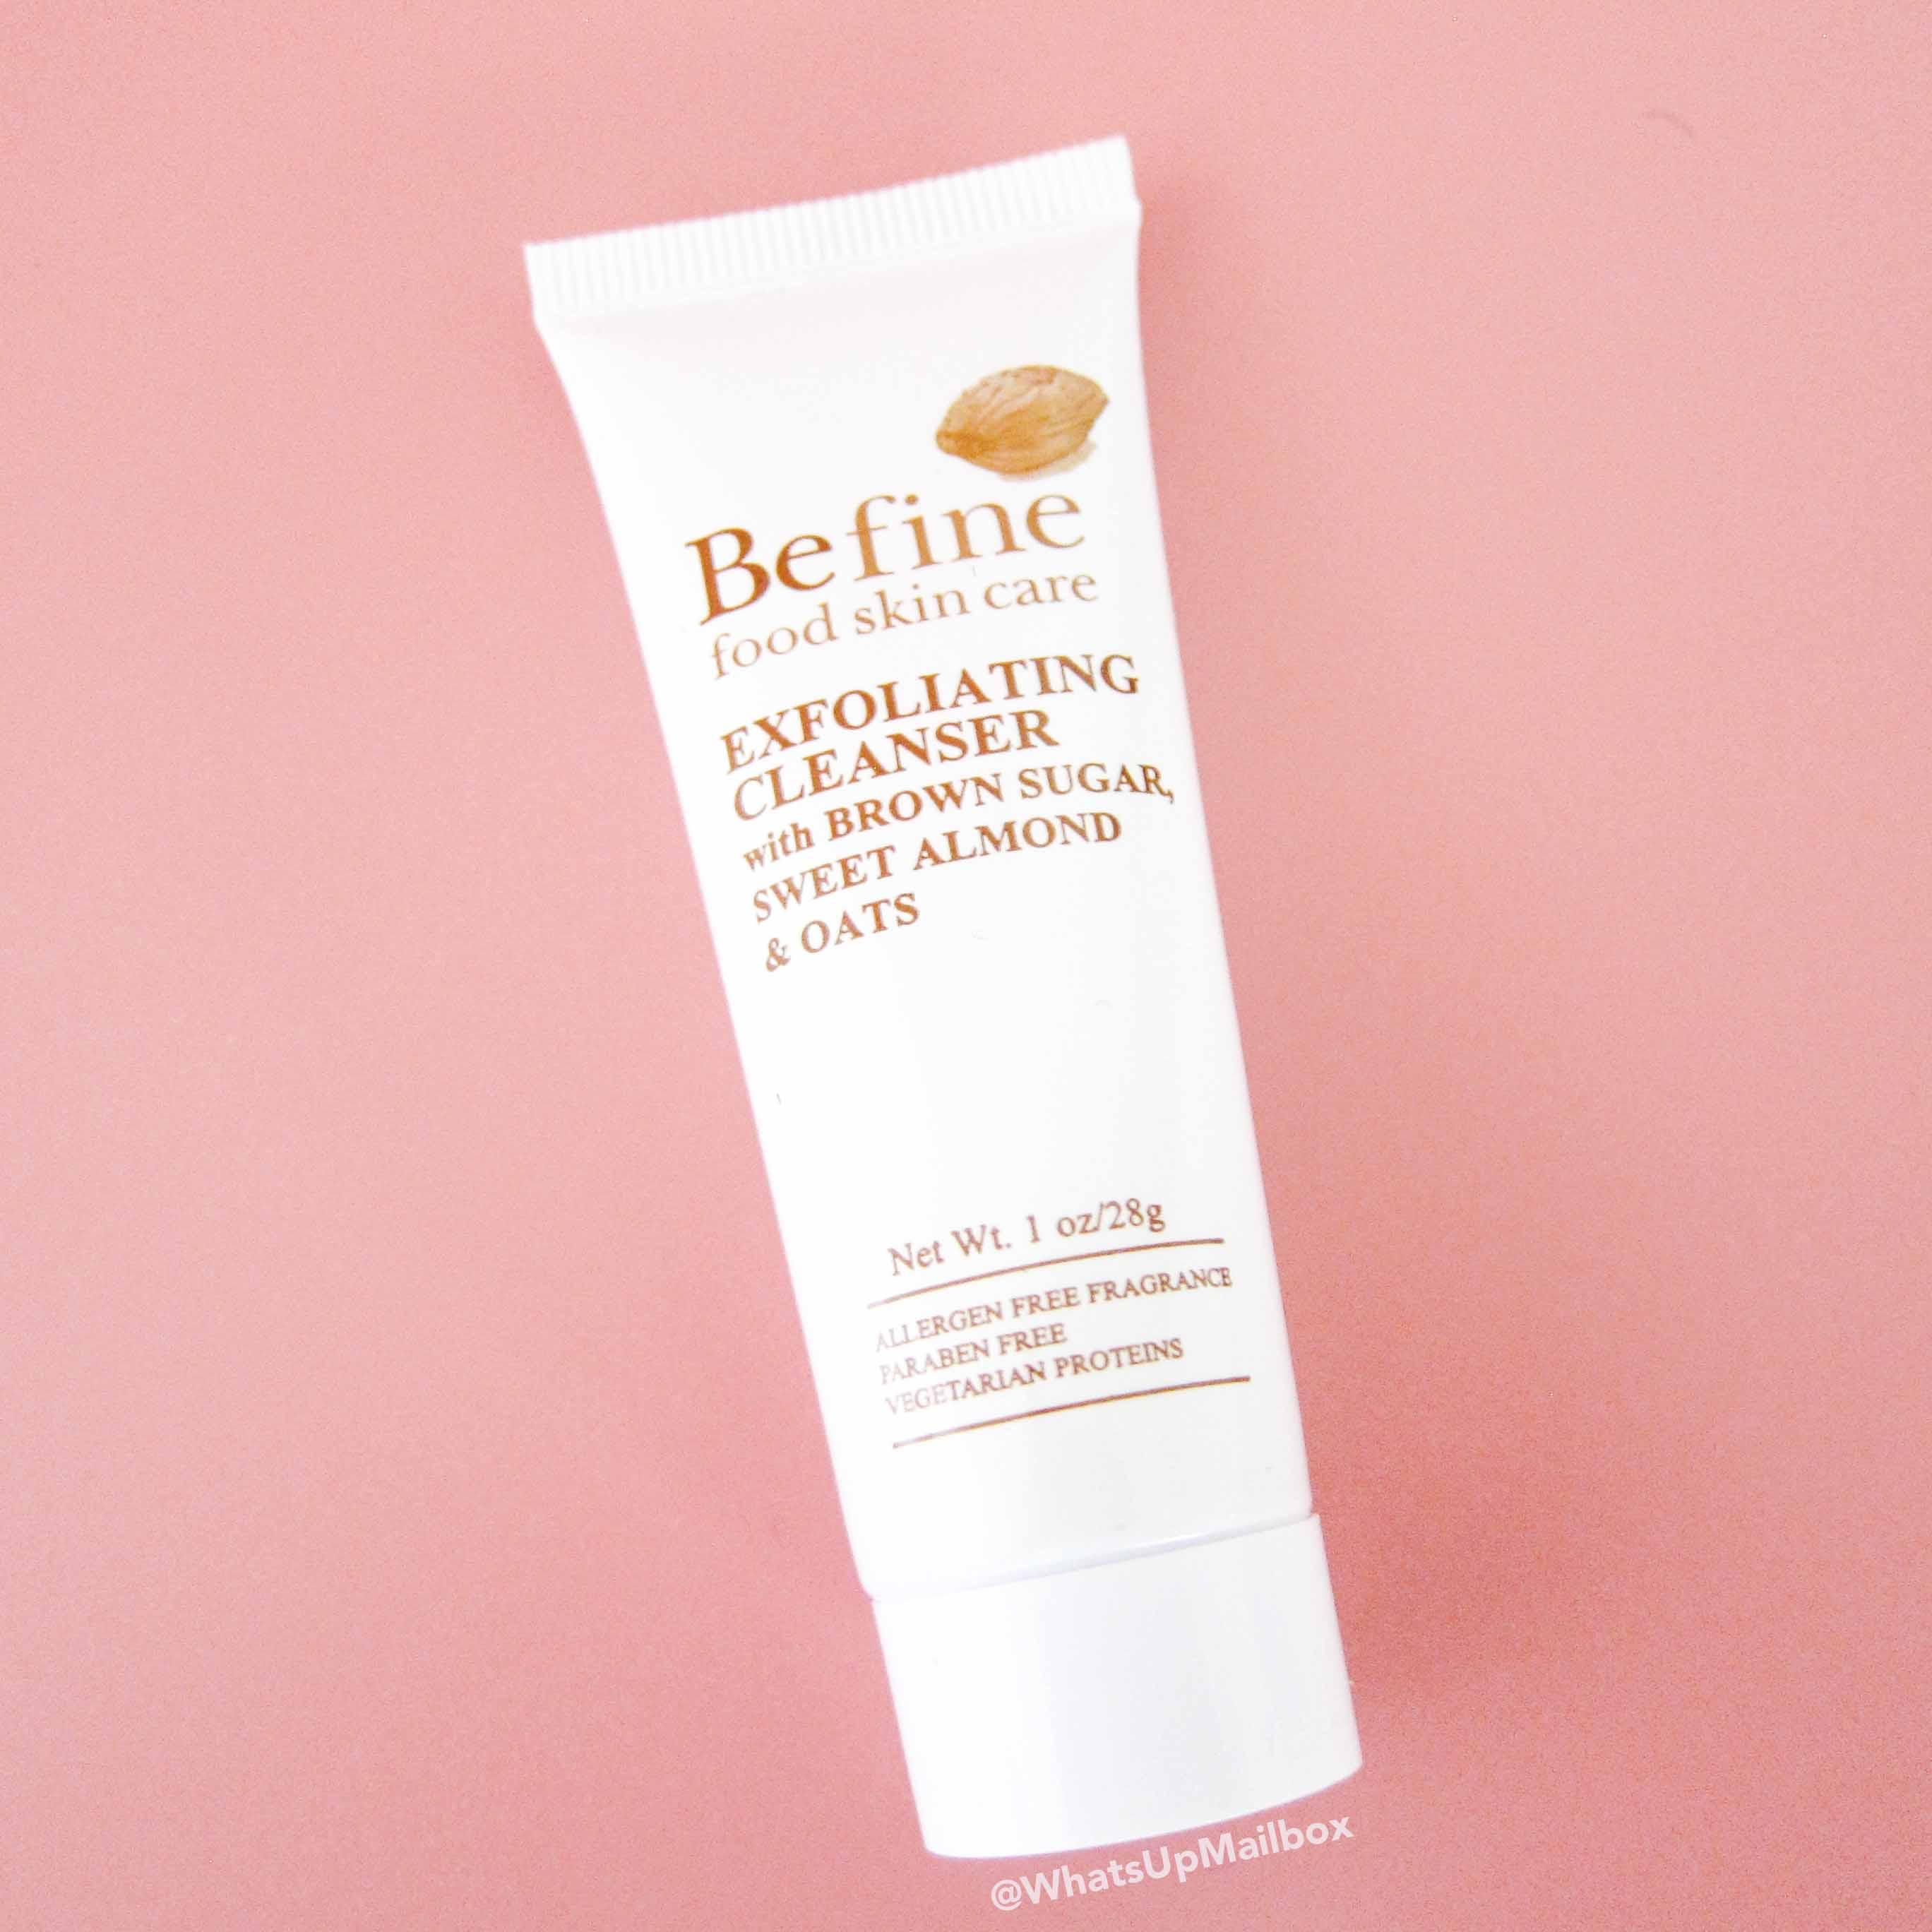 BeFine Food Skin Care - Exfoliating Cleanser